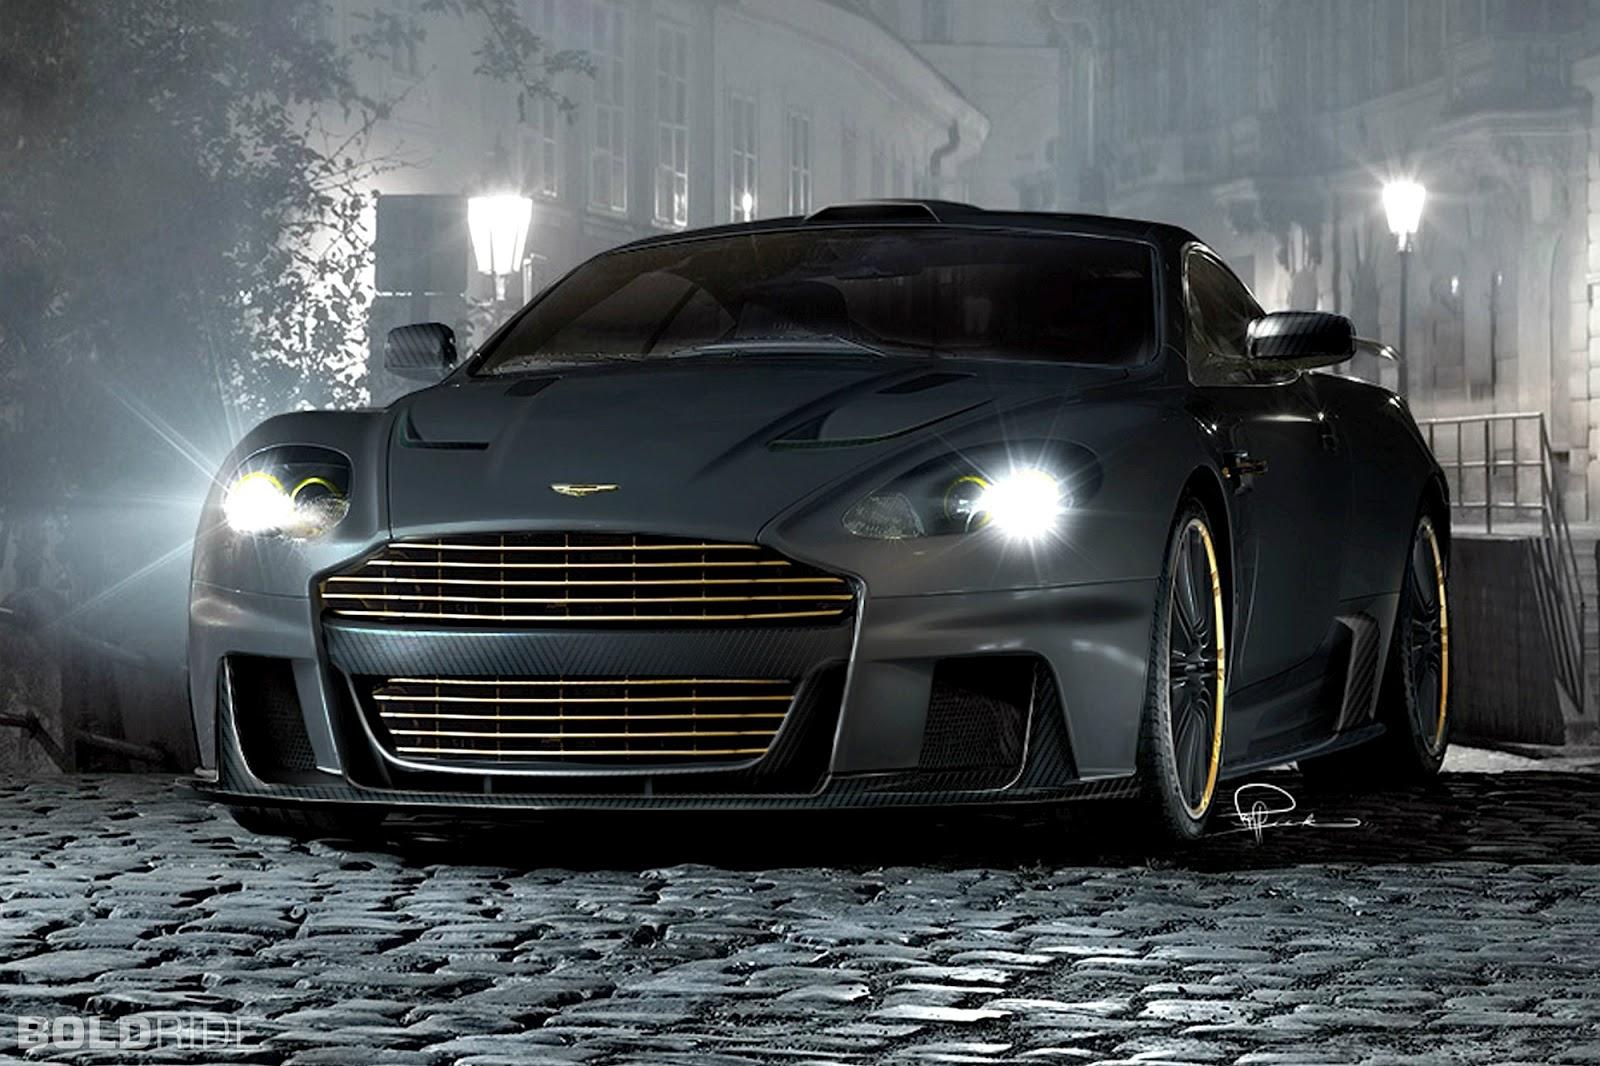 Aston Martin Dbs Carbon Edition By Wheelsandmore - 2012 aston martin dbs carbon edition by wheelsandmore